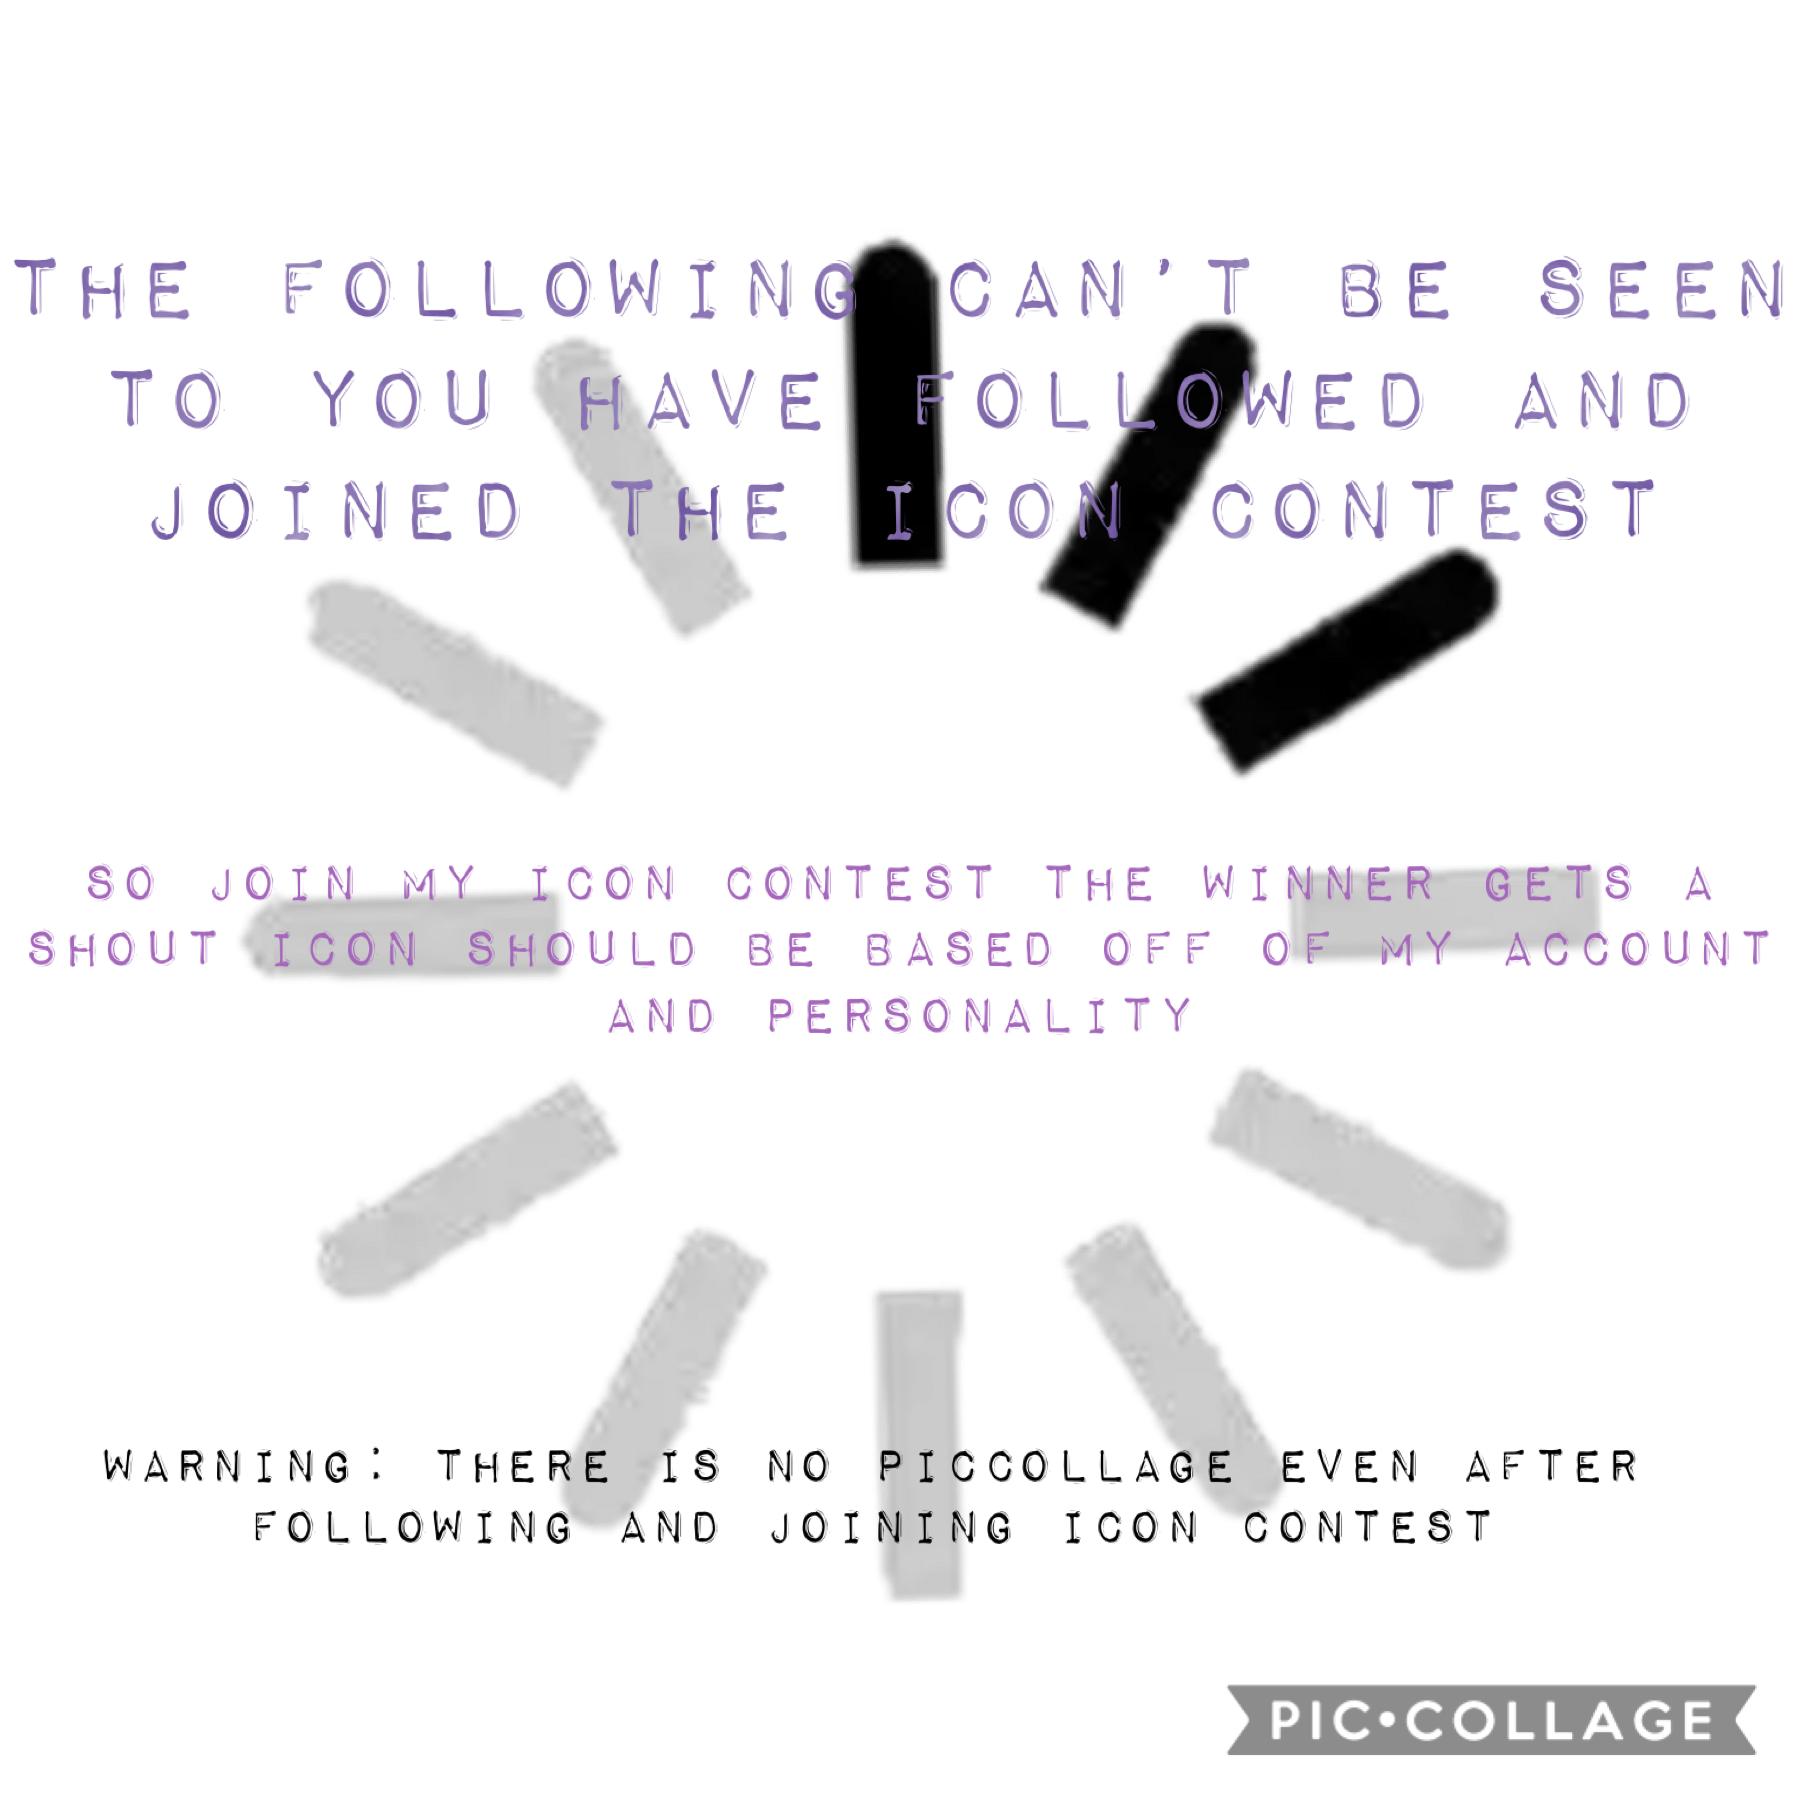 Icon contest